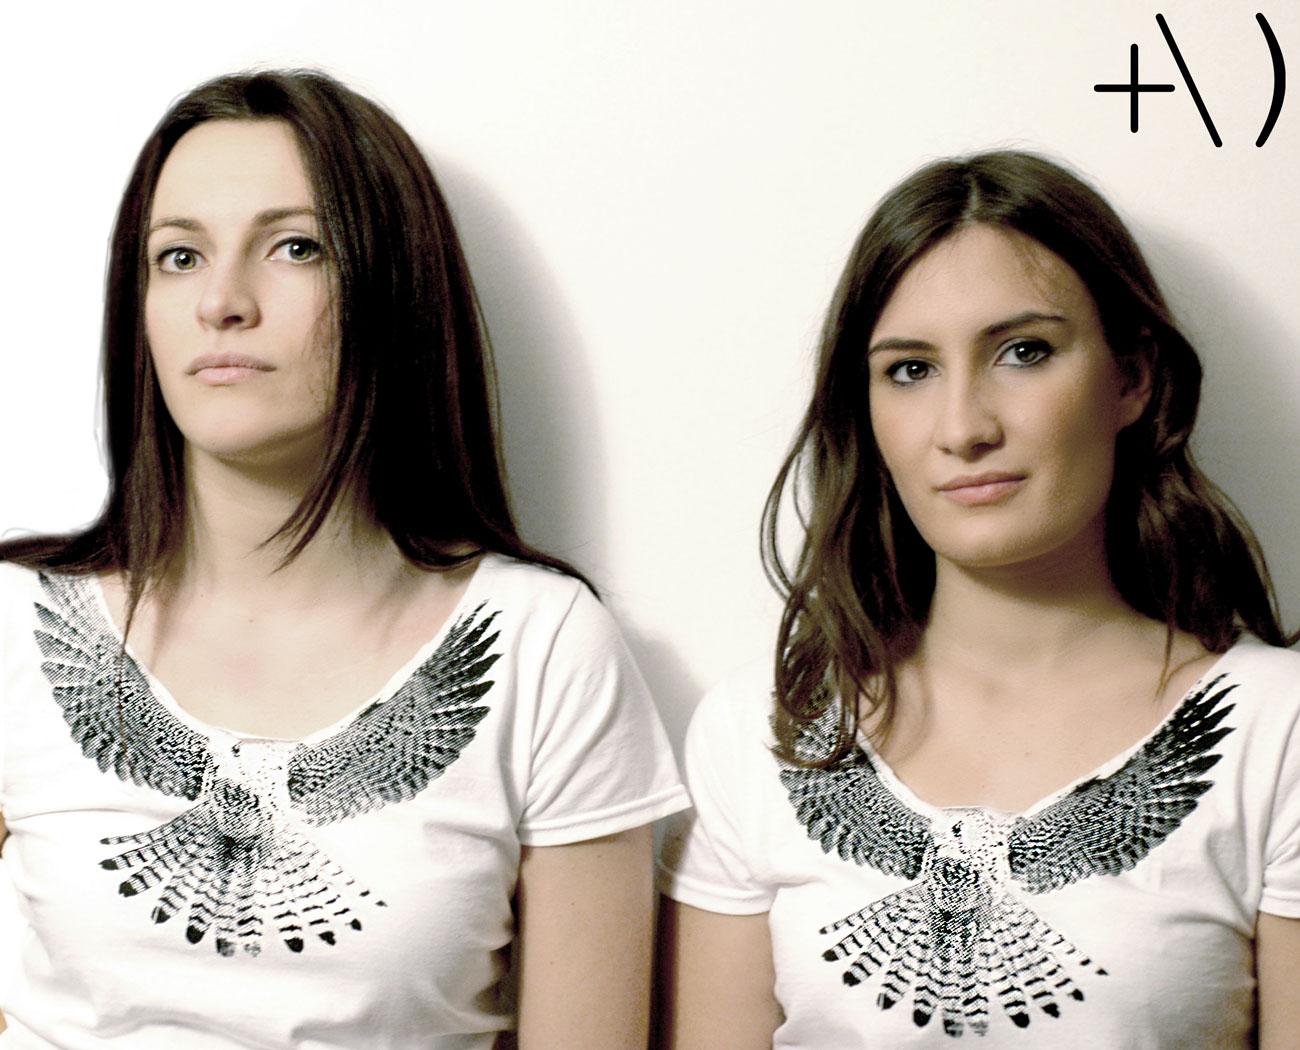 federicus 2015 female t-shirt falco scollatura